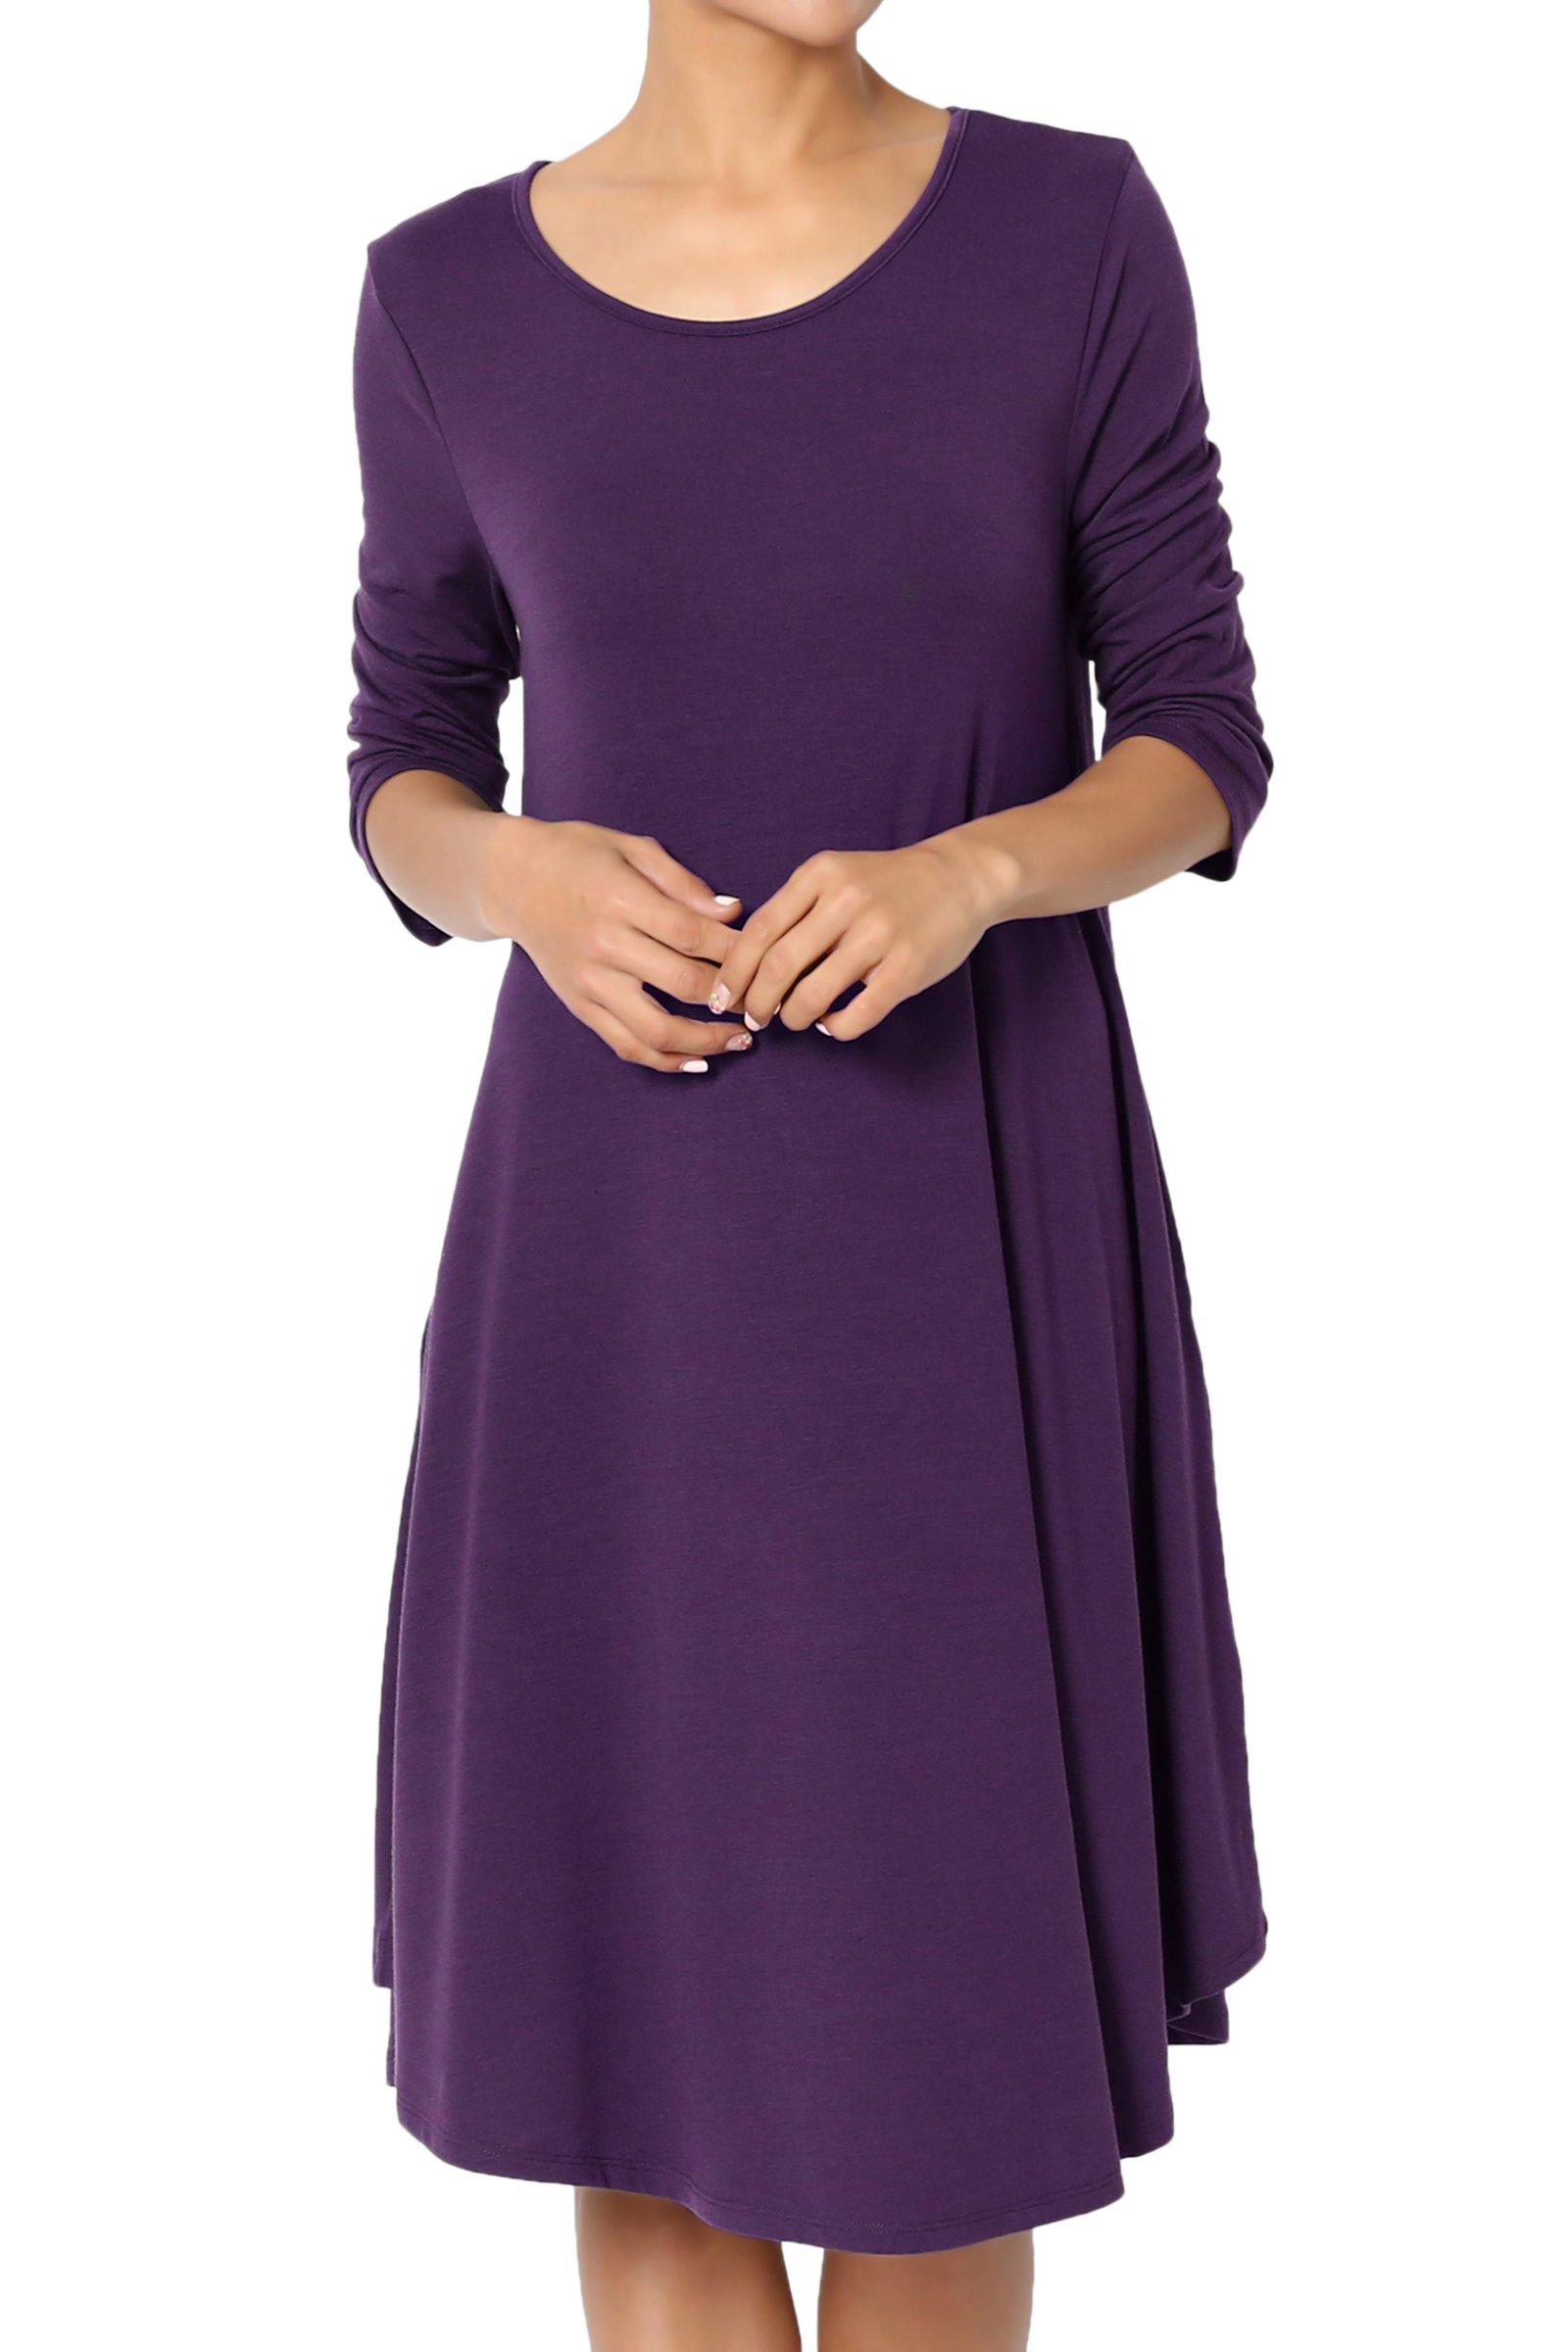 TheMogan Women's 3/4 Sleeve Trapeze Knit Pocket T-Shirt Dress Dark Purple 1XL